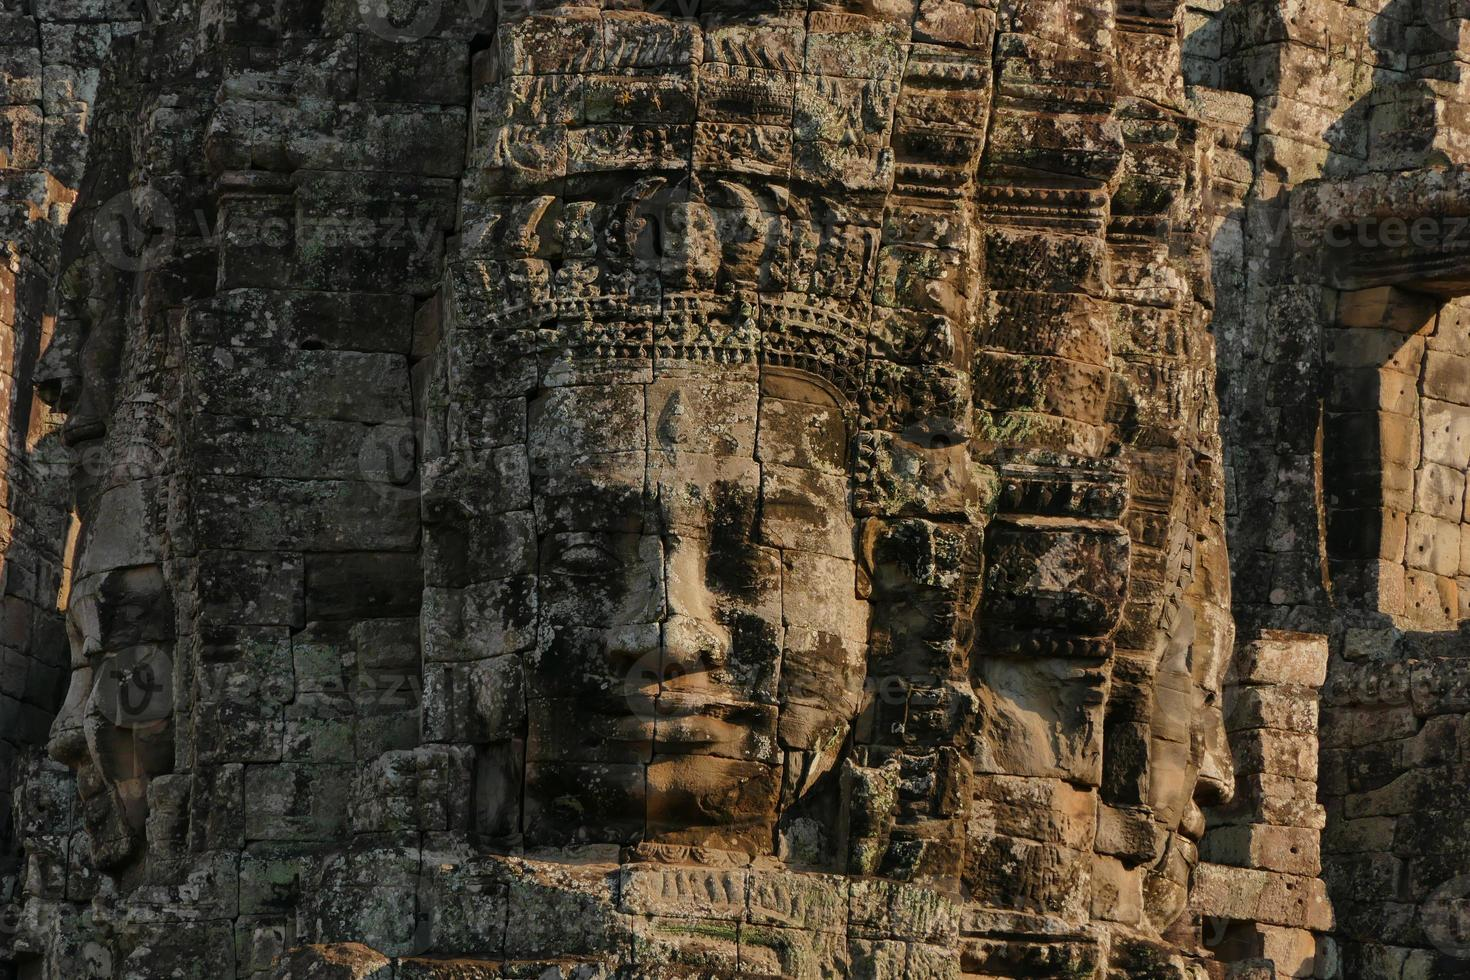 Bajon Tempel von Angkor Thom in Kambodscha foto